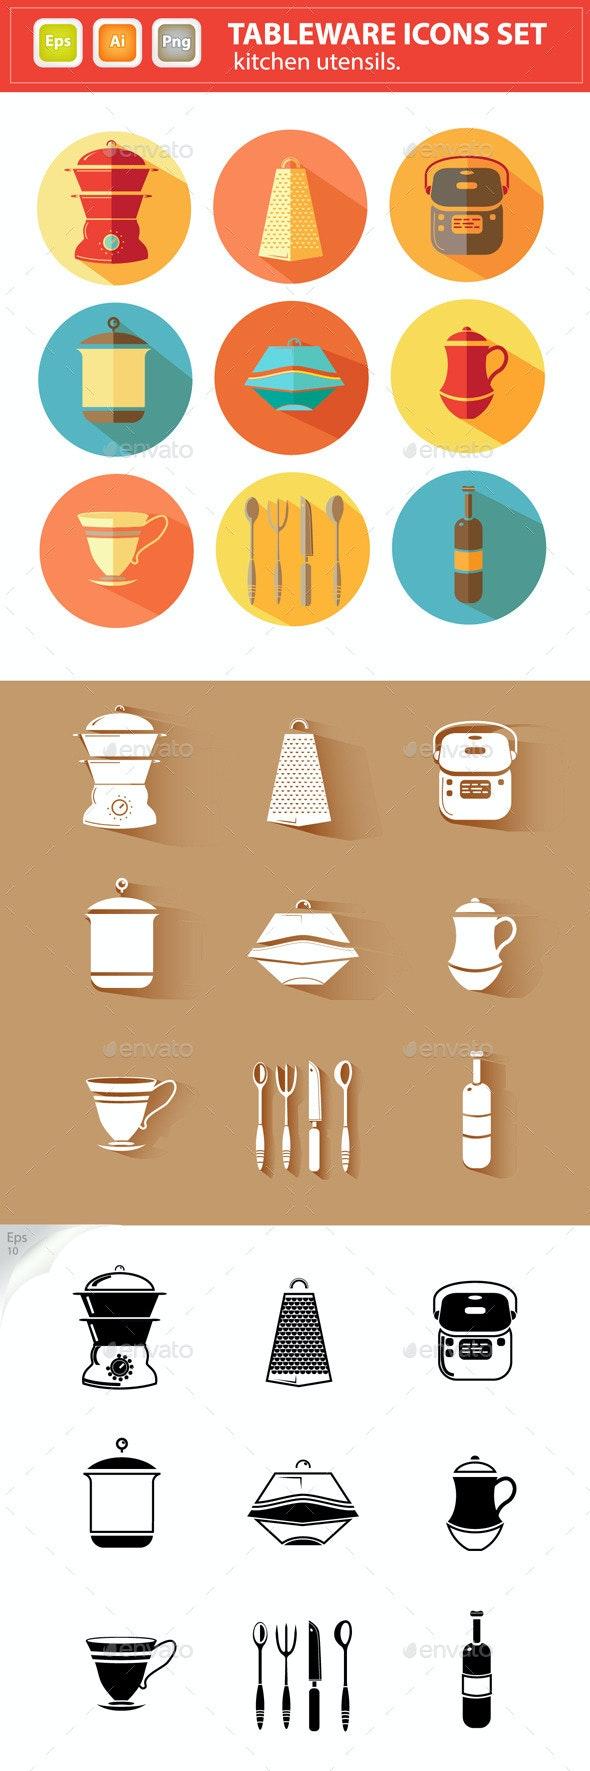 Vector Tableware Icons Set. Kitchen Utensils.